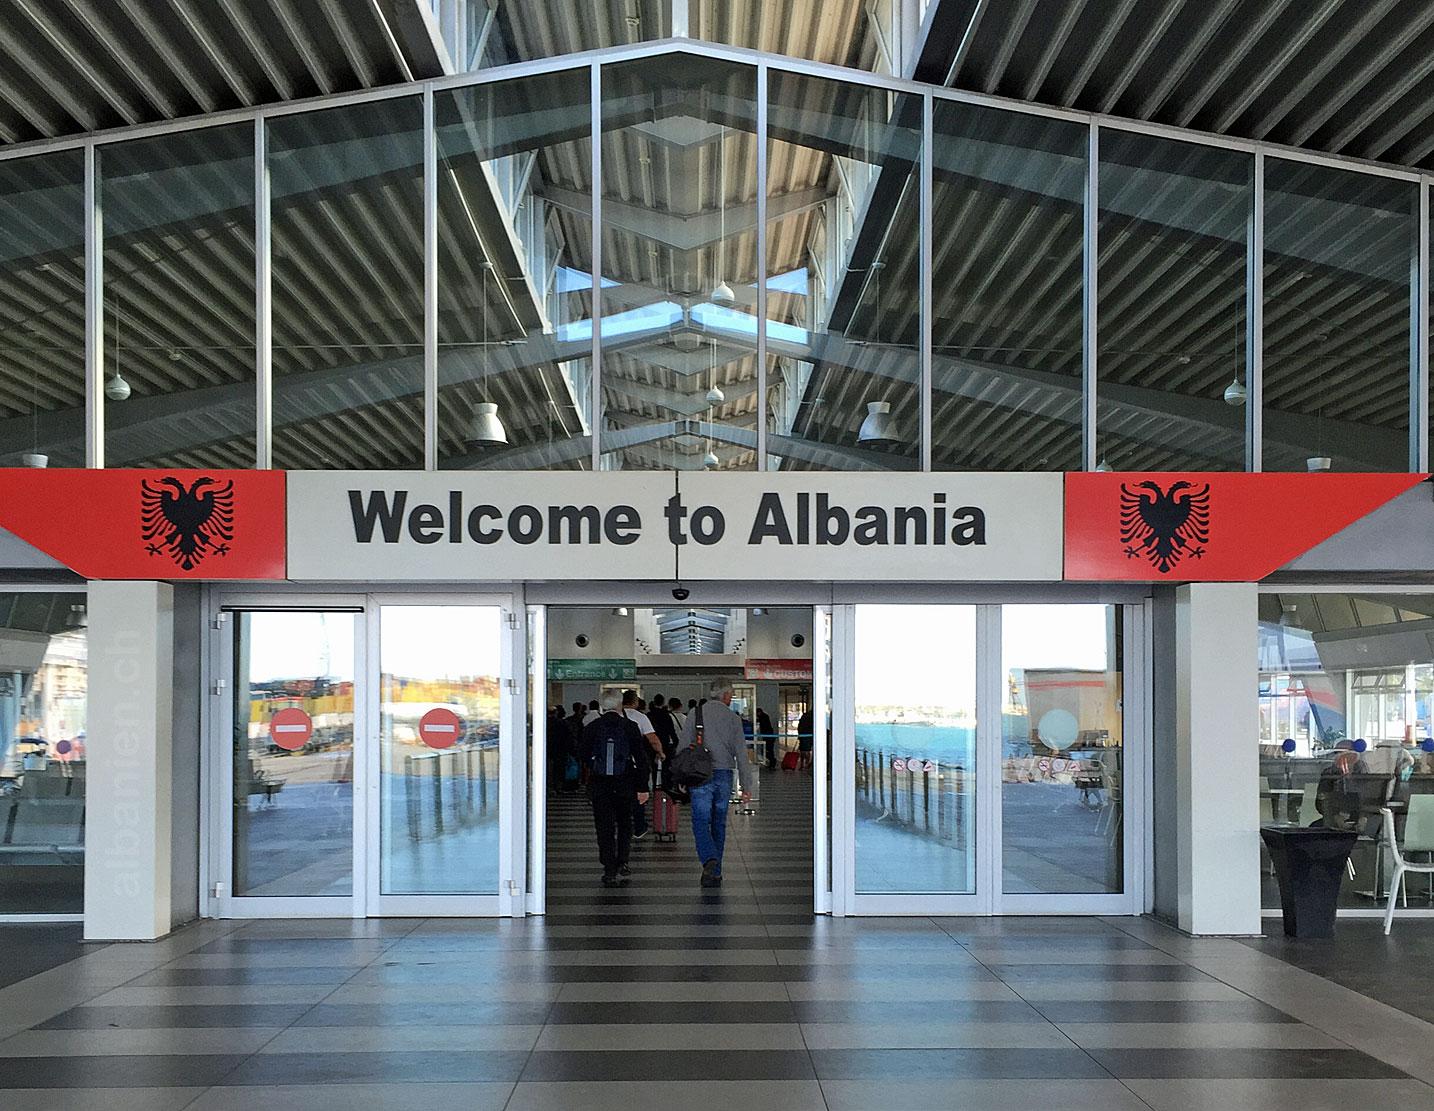 Willkommen in Albanien